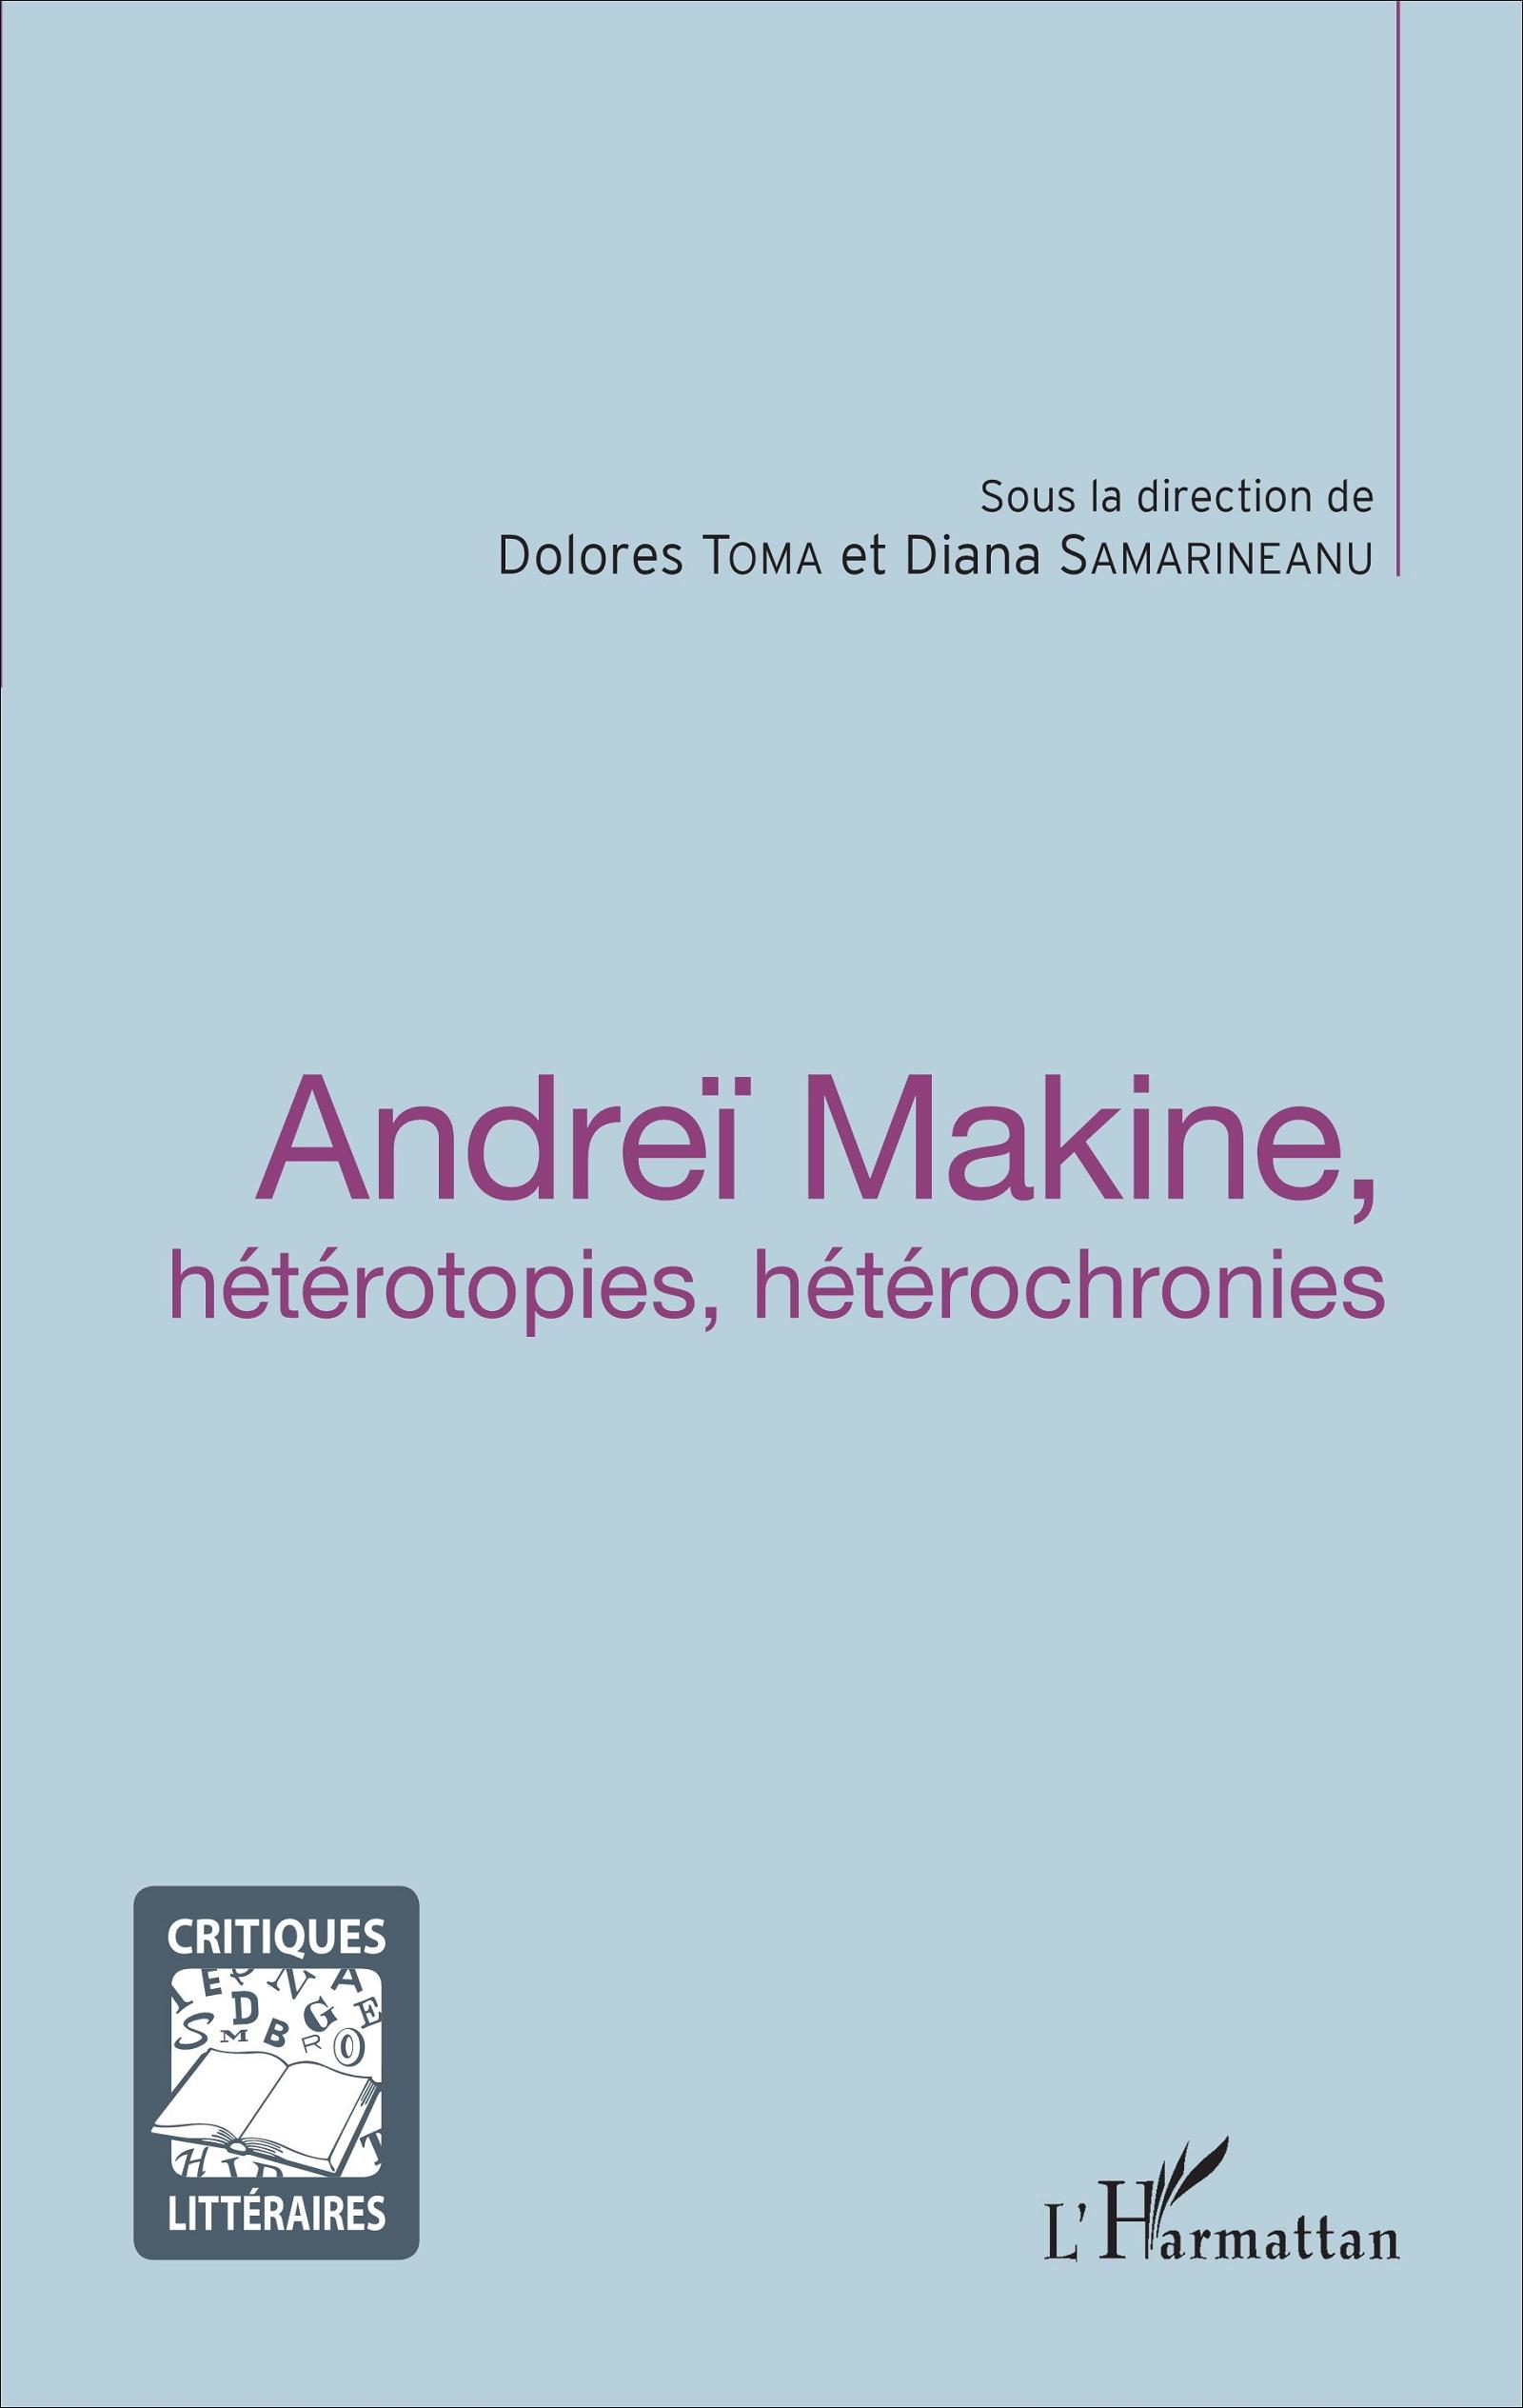 D. Toma et D. Samarineanu (dir.), Andreï Makine, hétérotopies, hétérochronies